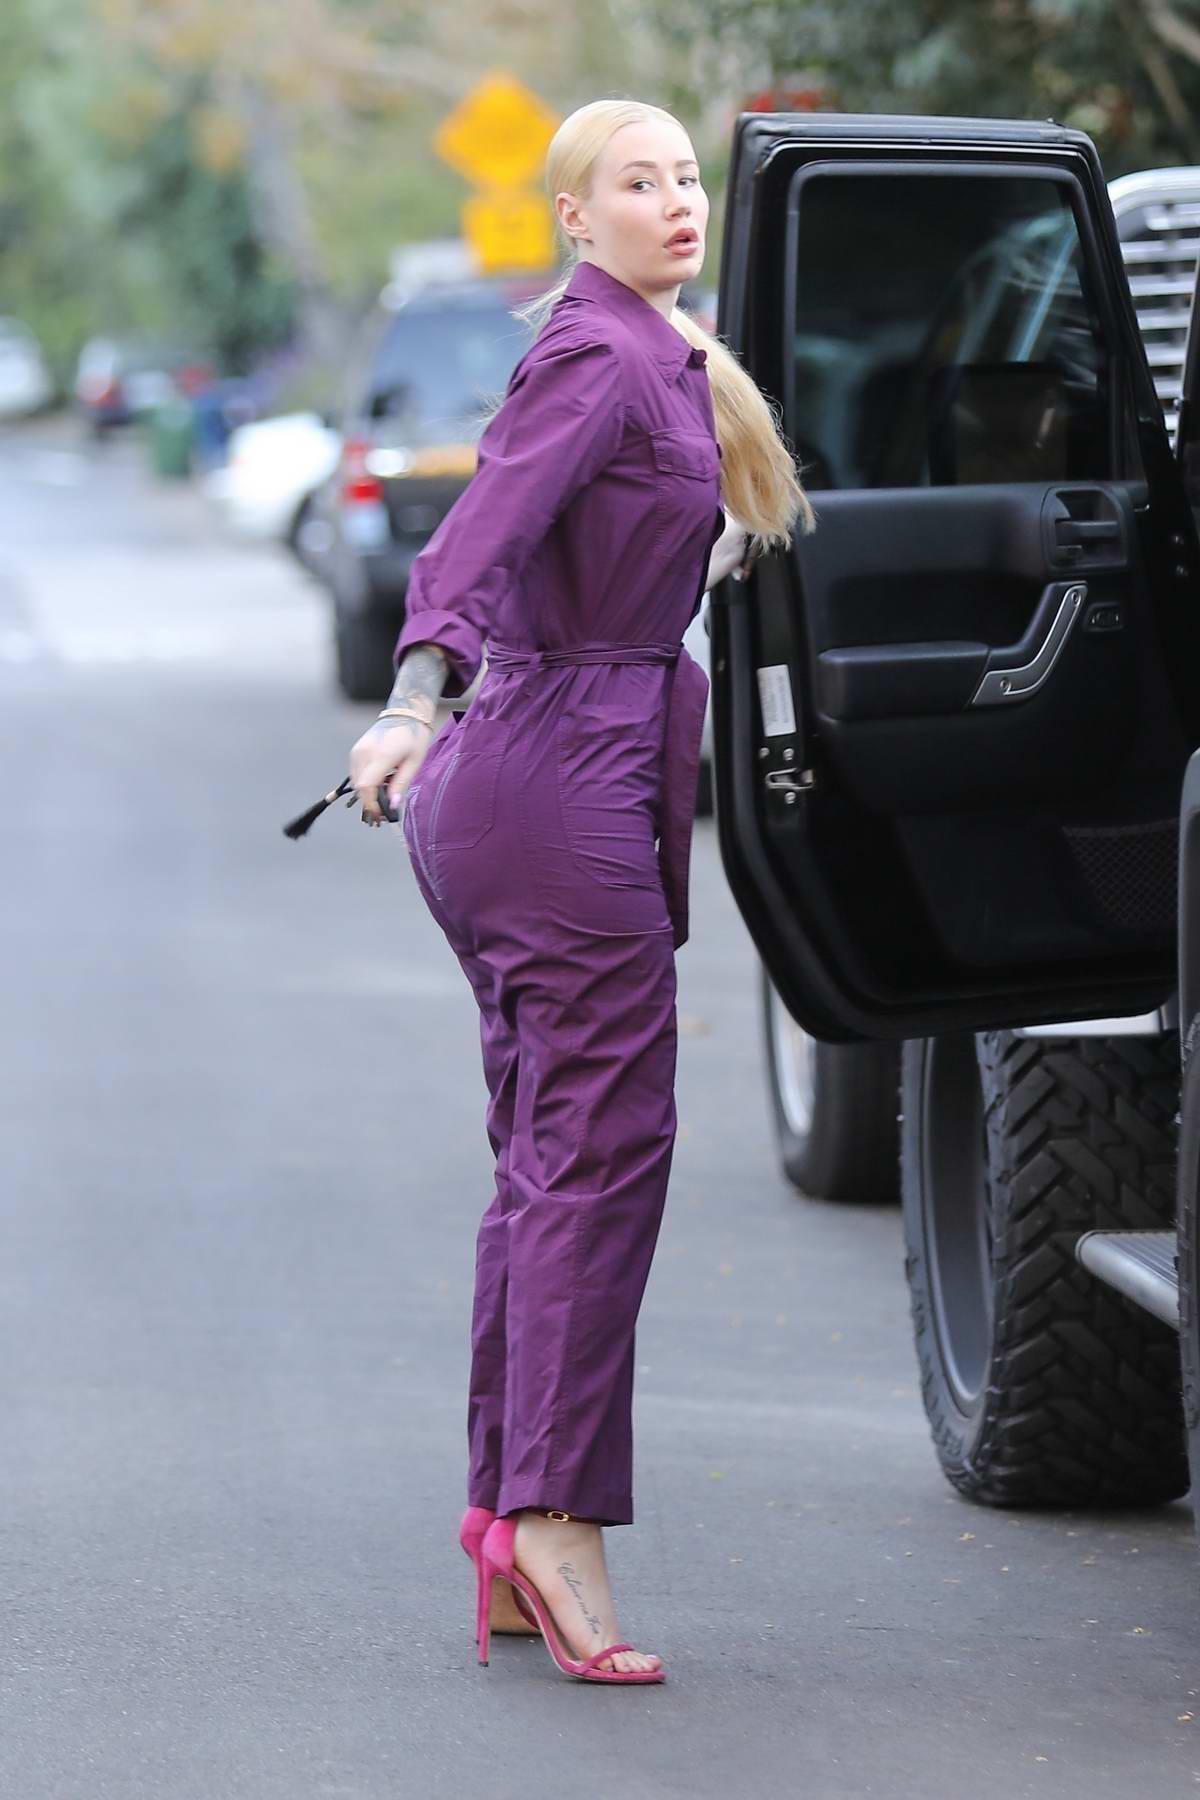 Iggy Azalea in a purple jumsuit arriving to a Halloween party in Studio City, Los Angeles